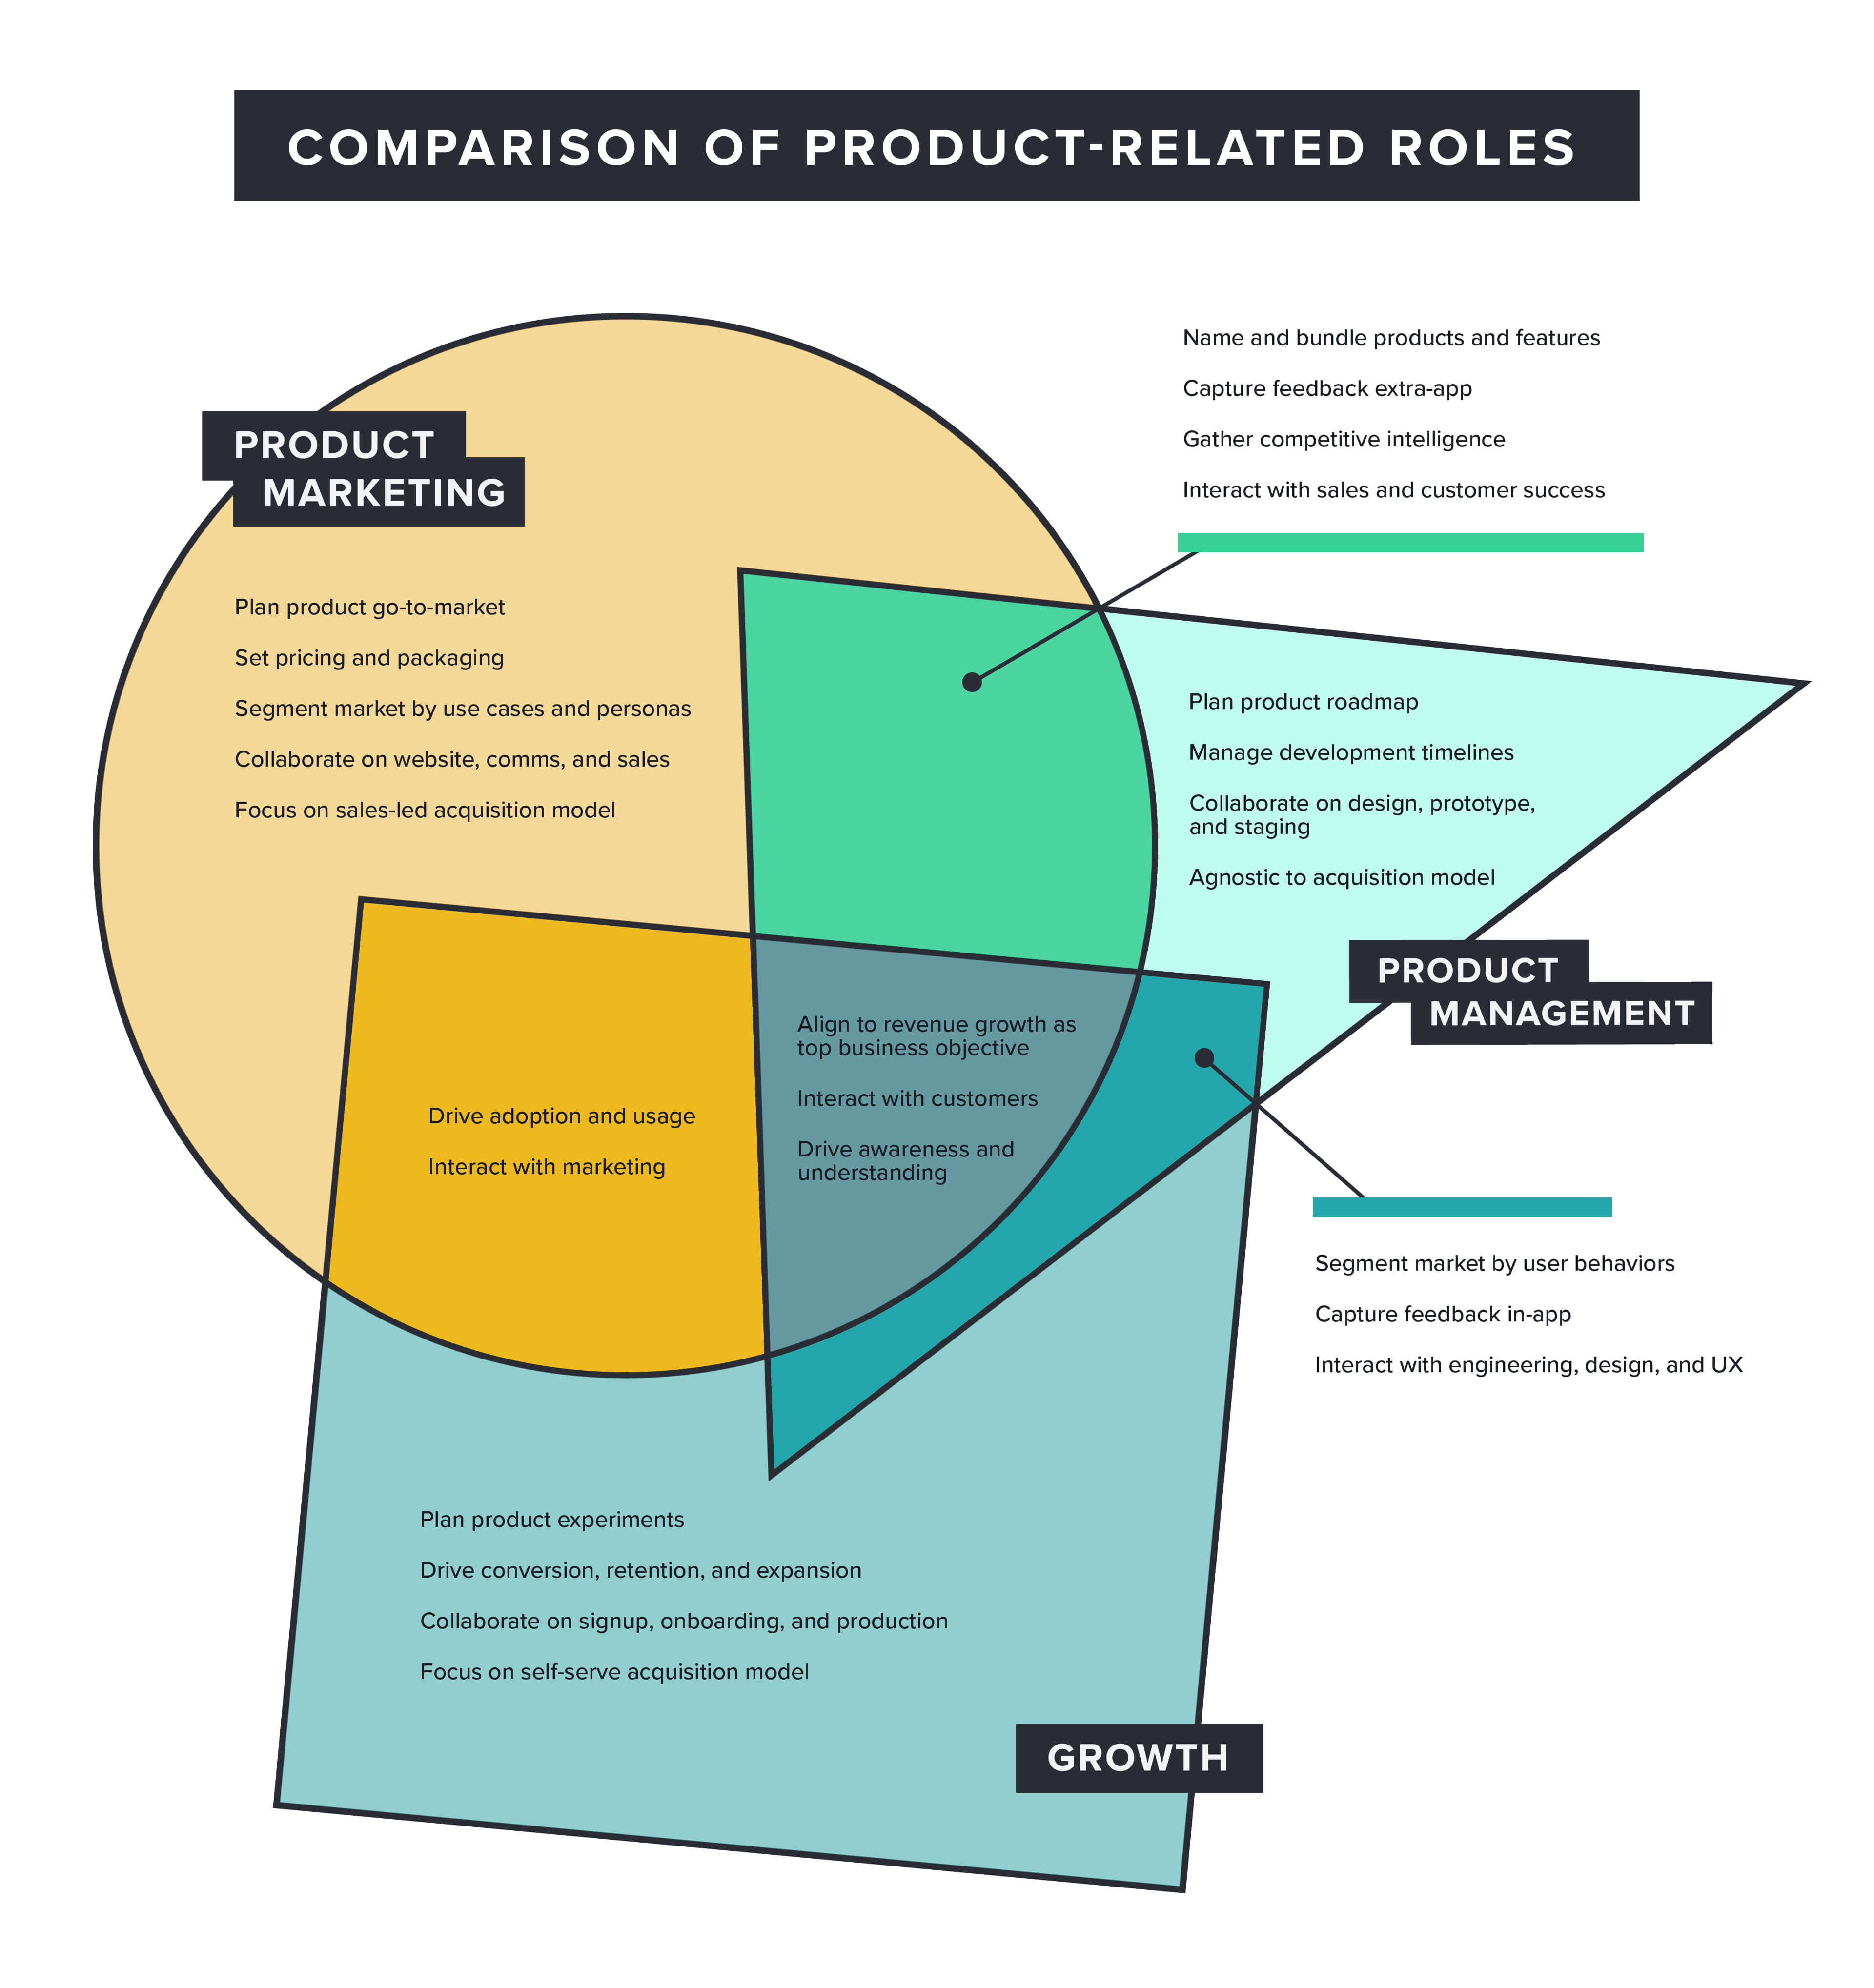 What Is A Venn Diagram Venn Diagram A Comparison Of Product Related Roles Productcraft